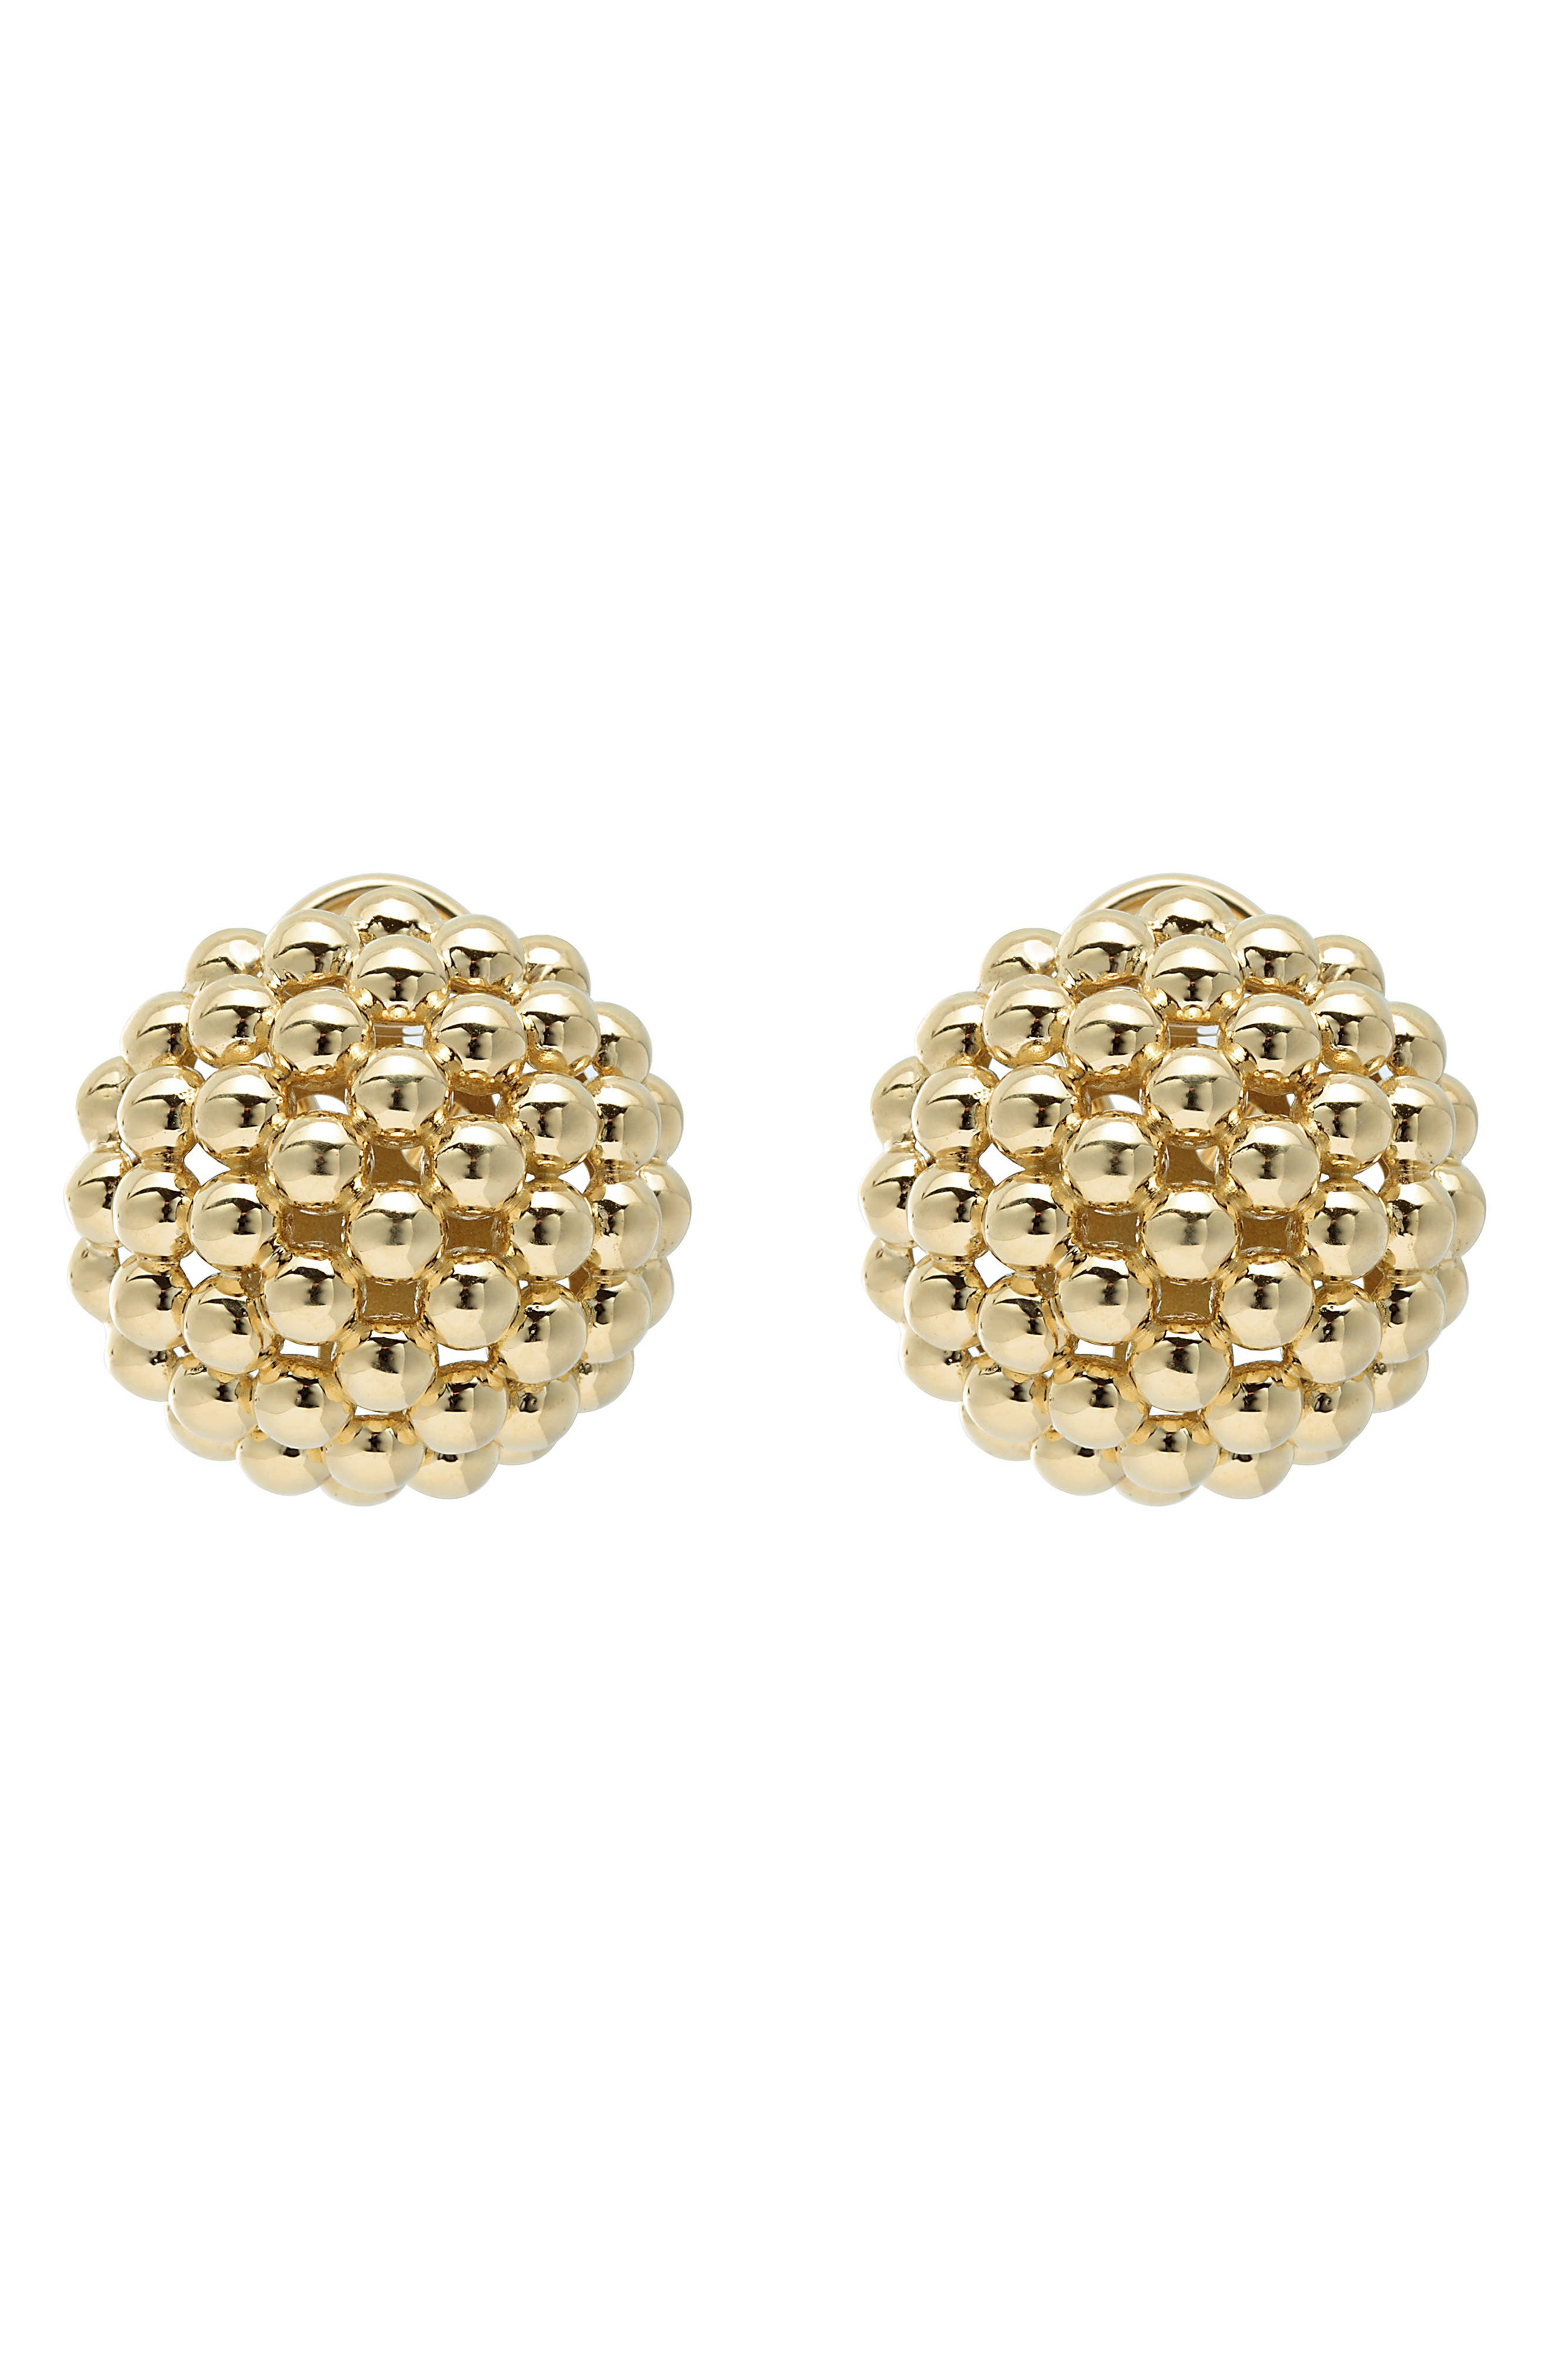 Caviar Gold Dome Omega Earrings,                             Alternate thumbnail 3, color,                             Gold